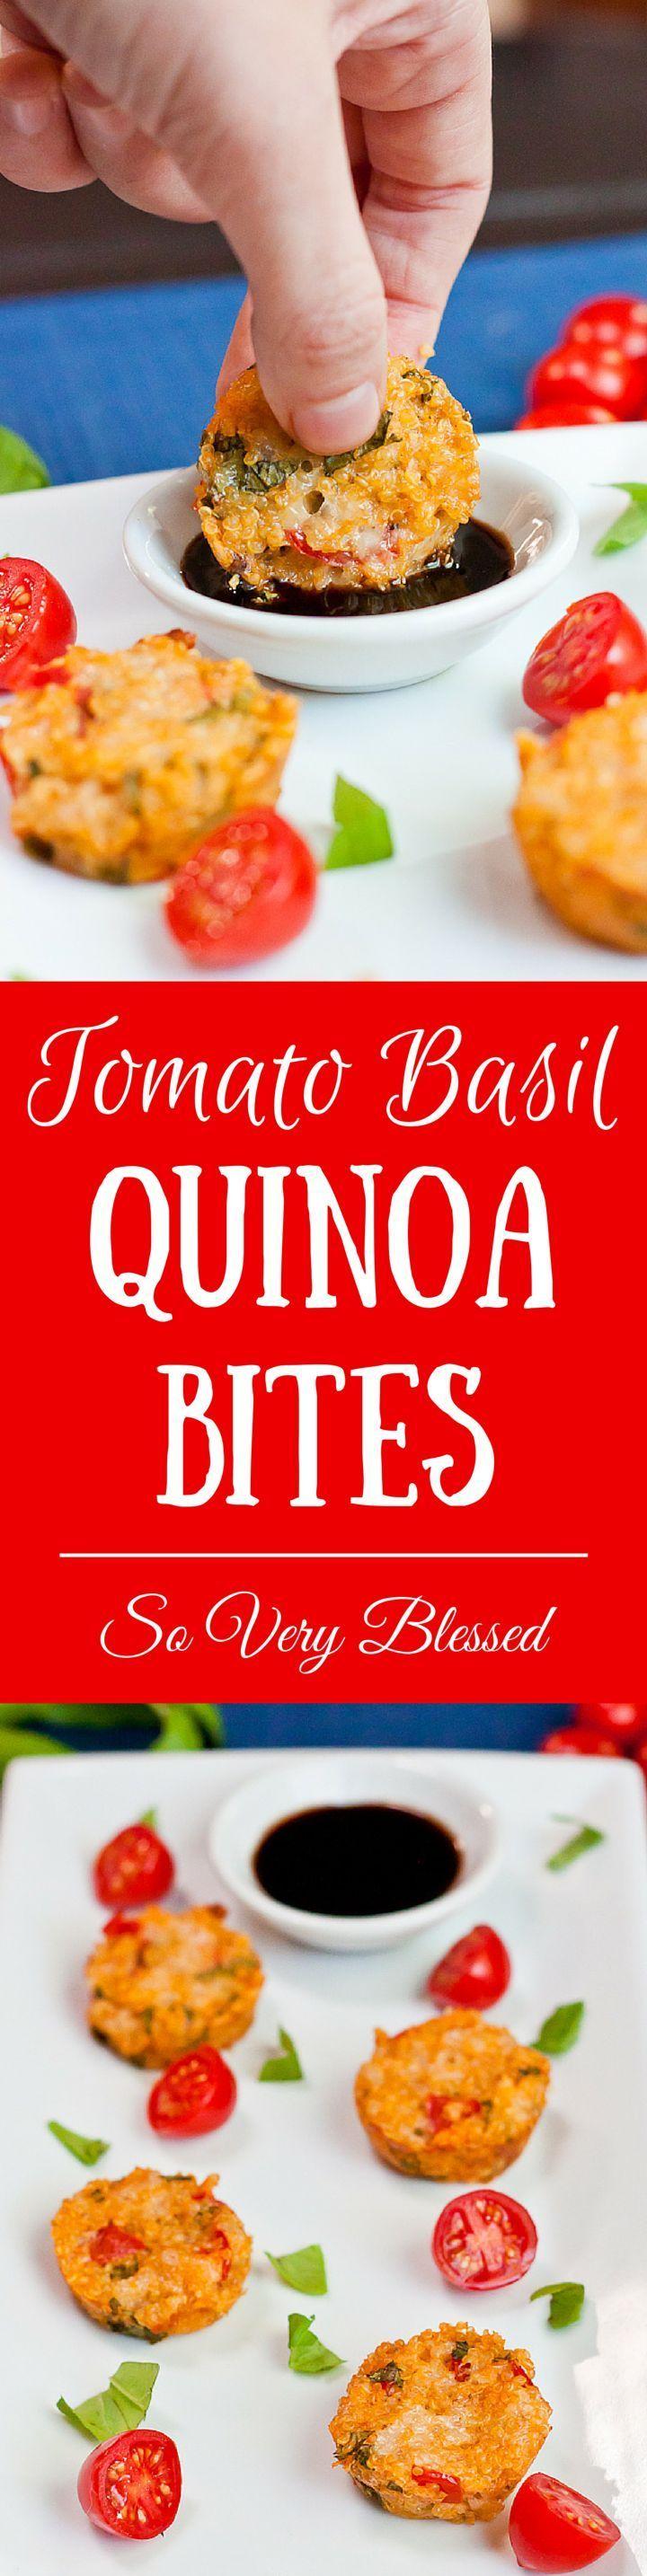 Tomato Basil Quinoa Bites Recipe With the basil, tomatoes, and mozzarella, these are like tiny litt